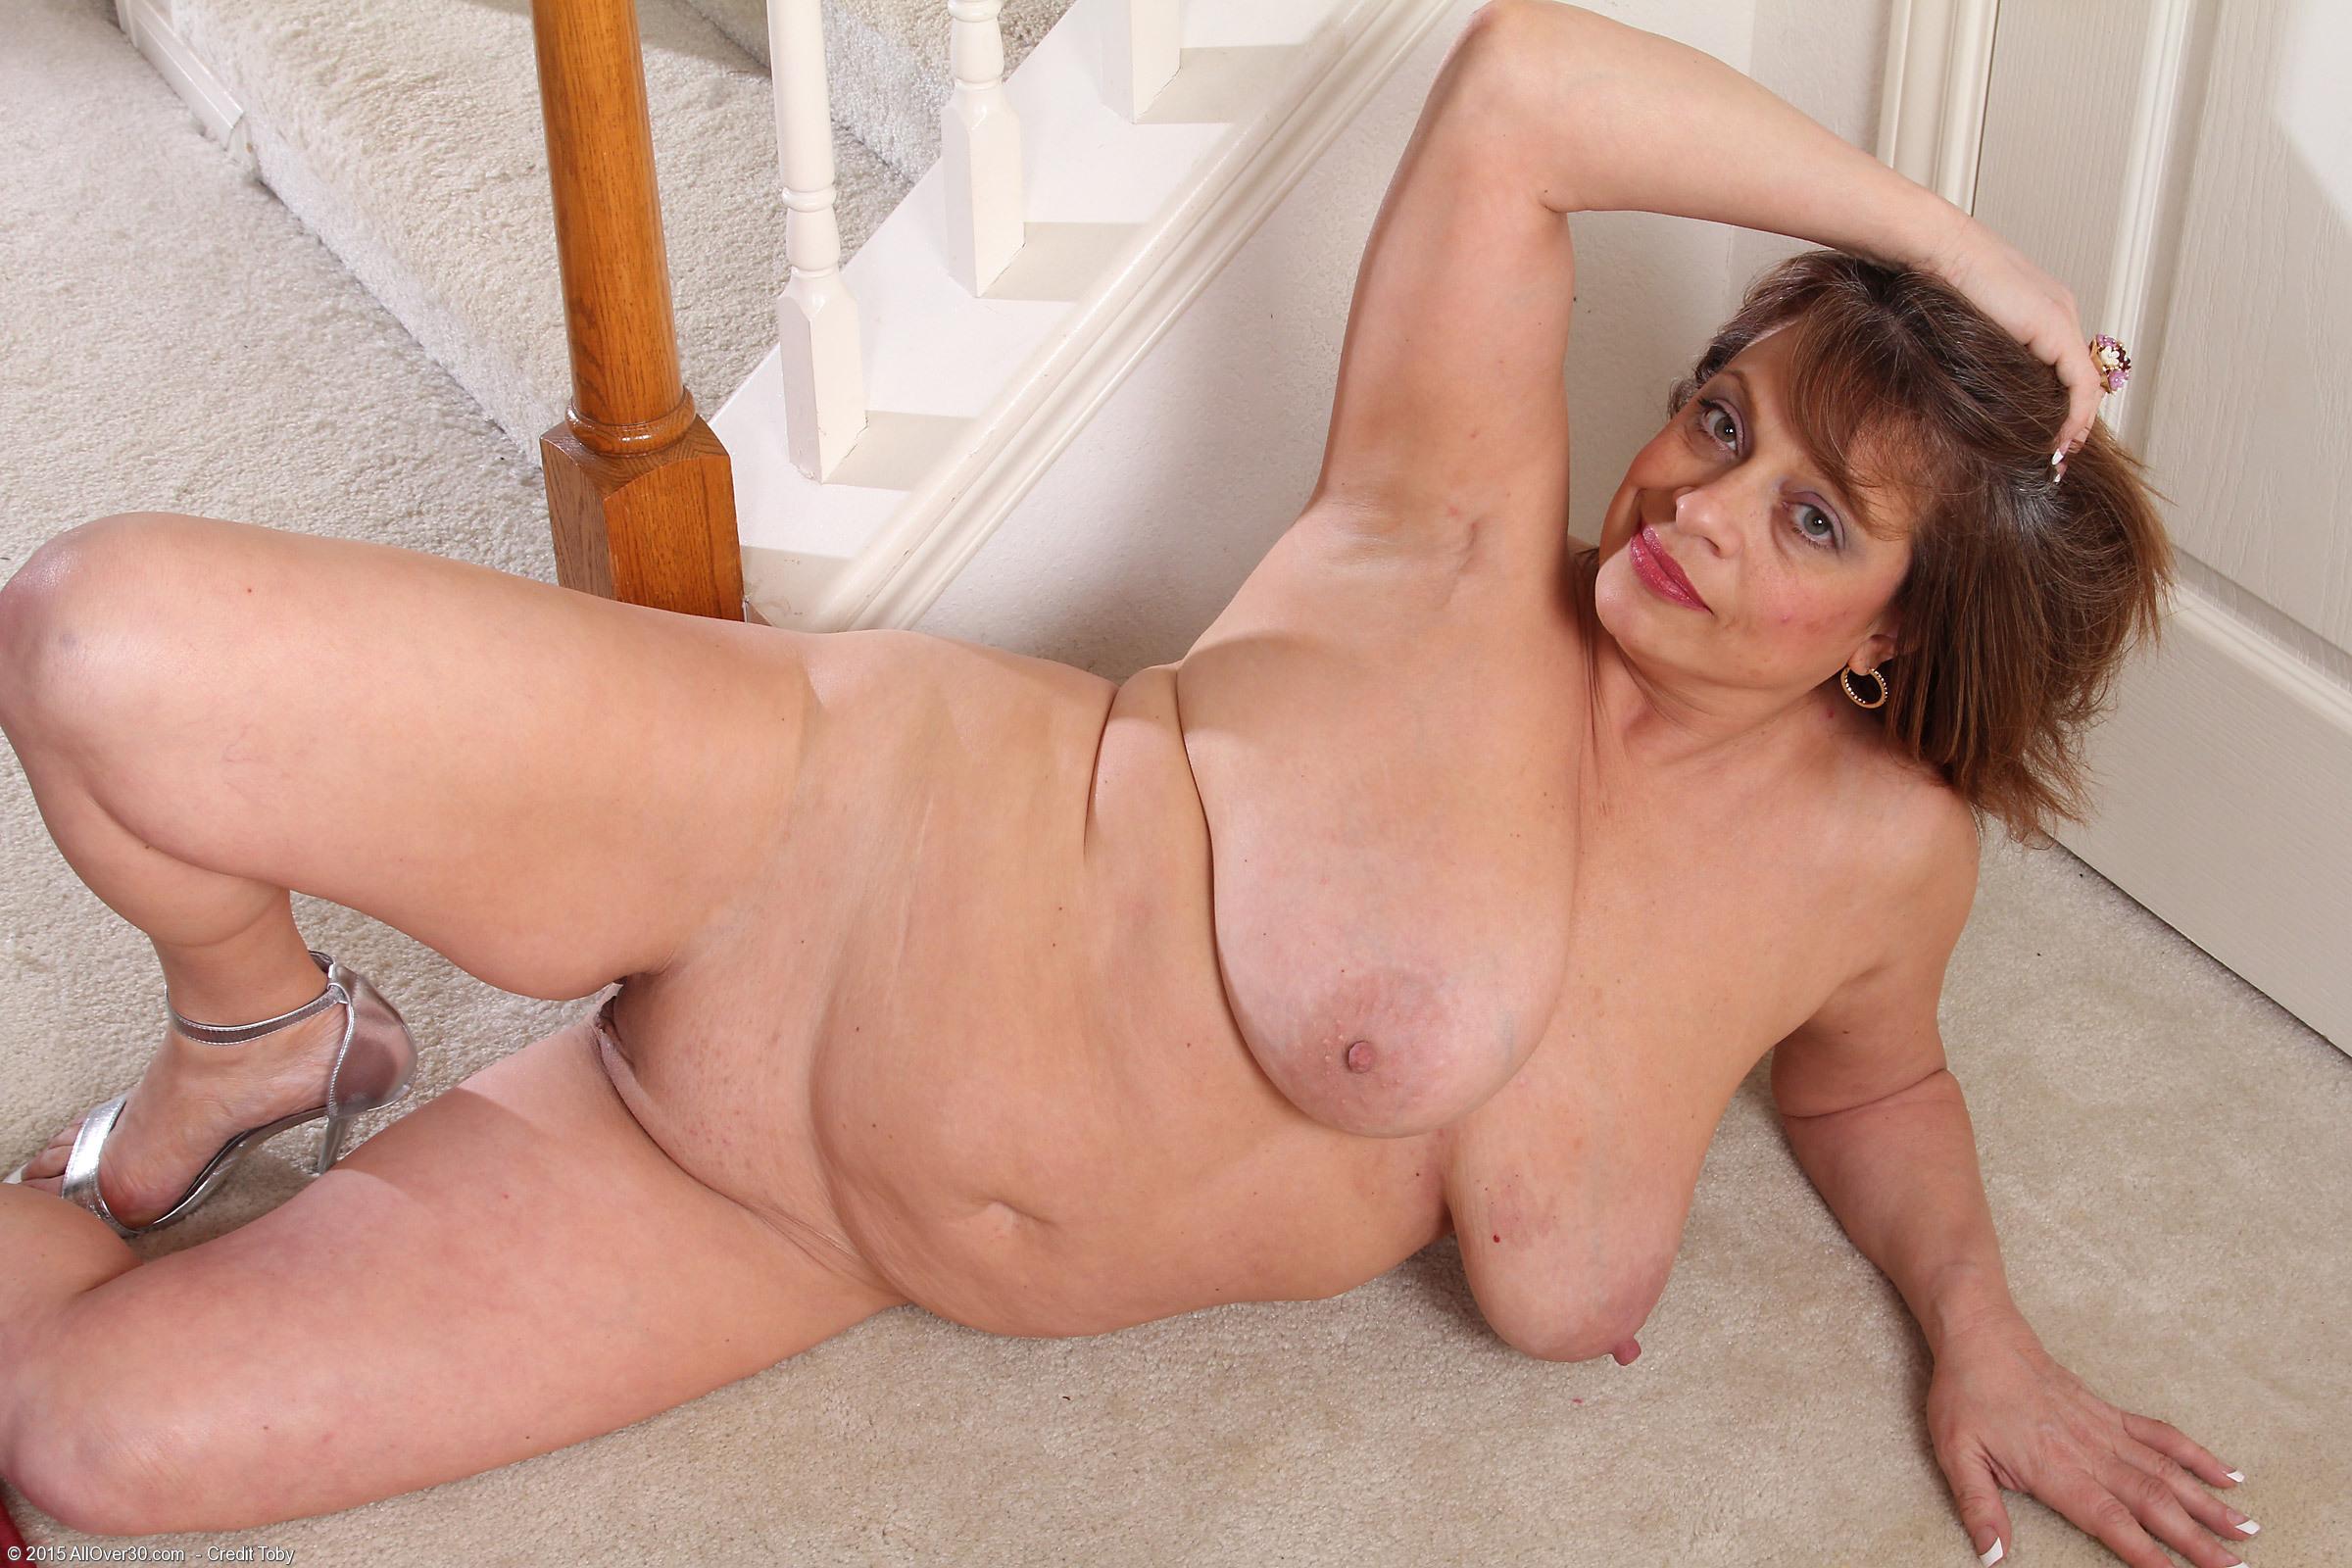 Nude Mature Porn, Mature Porn Galleries, Naked Women Pics